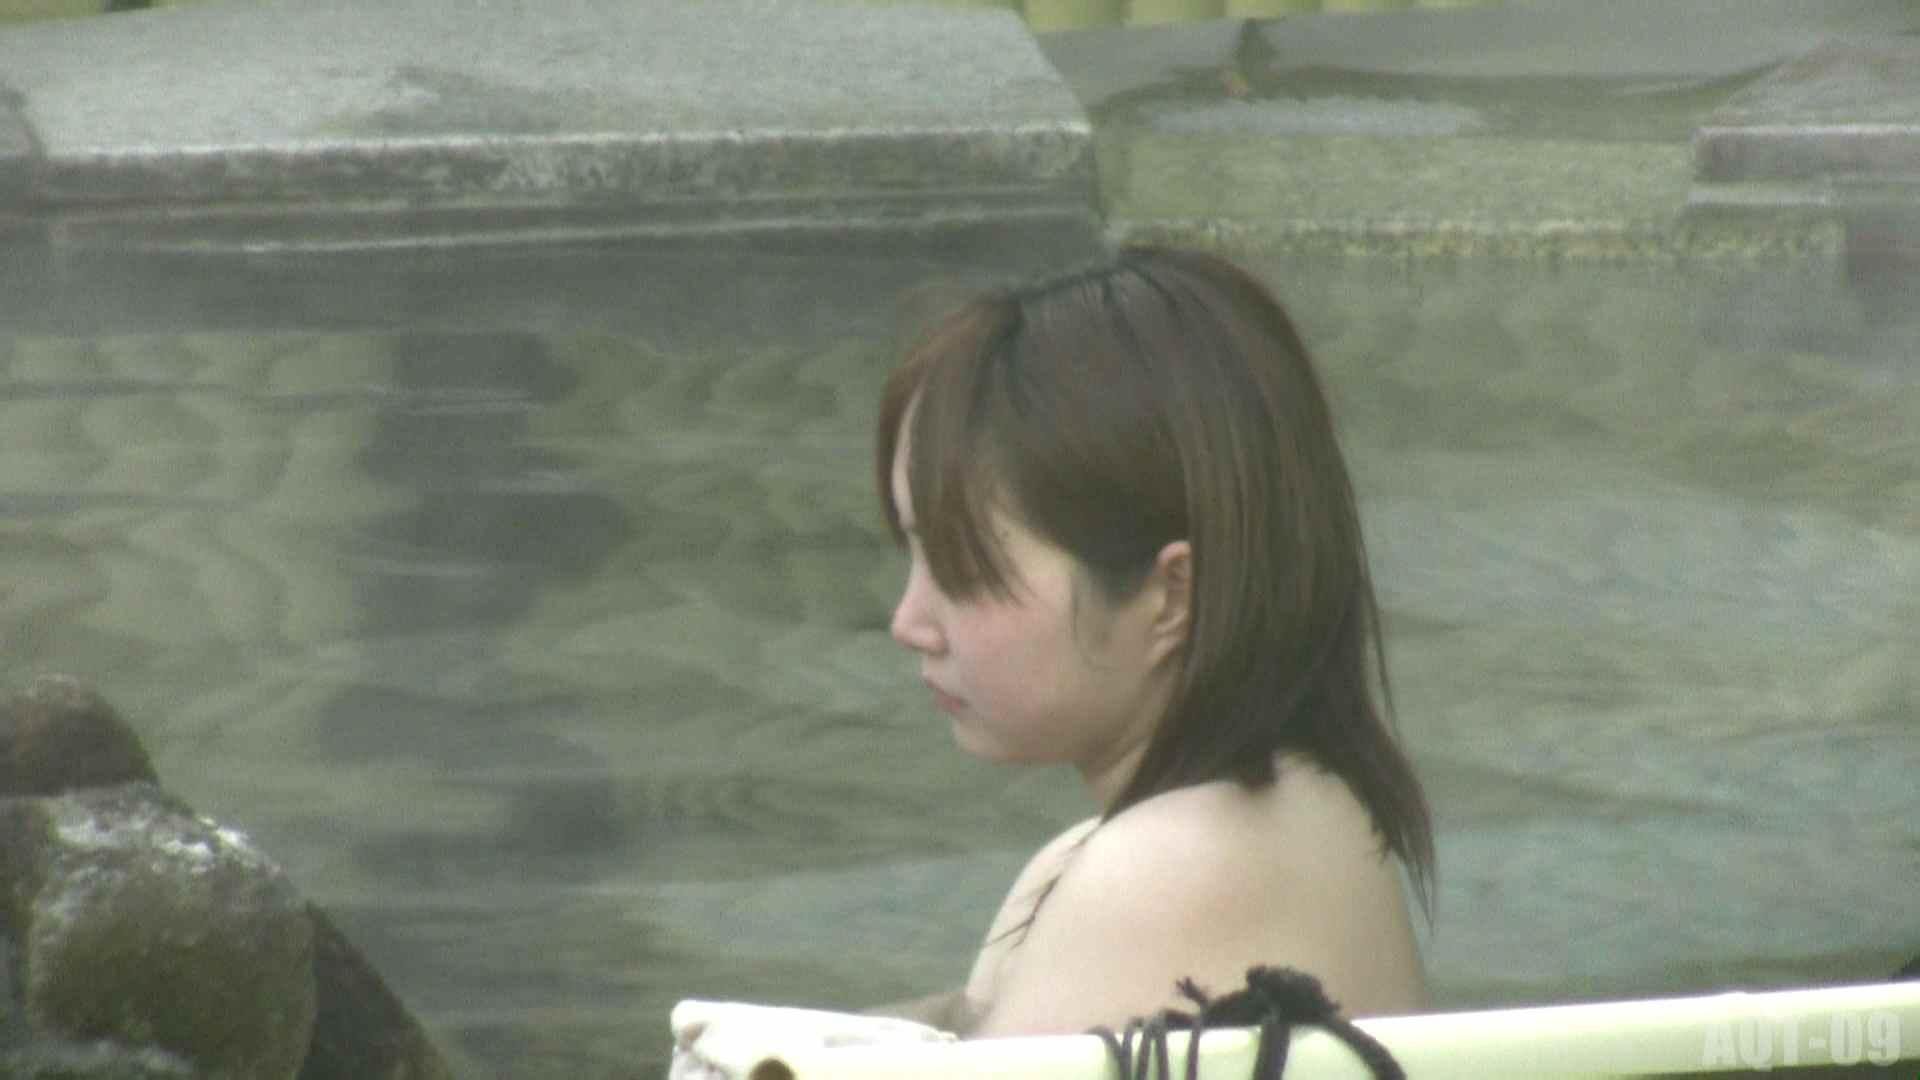 Aquaな露天風呂Vol.781 盗撮 濡れ場動画紹介 93連発 38